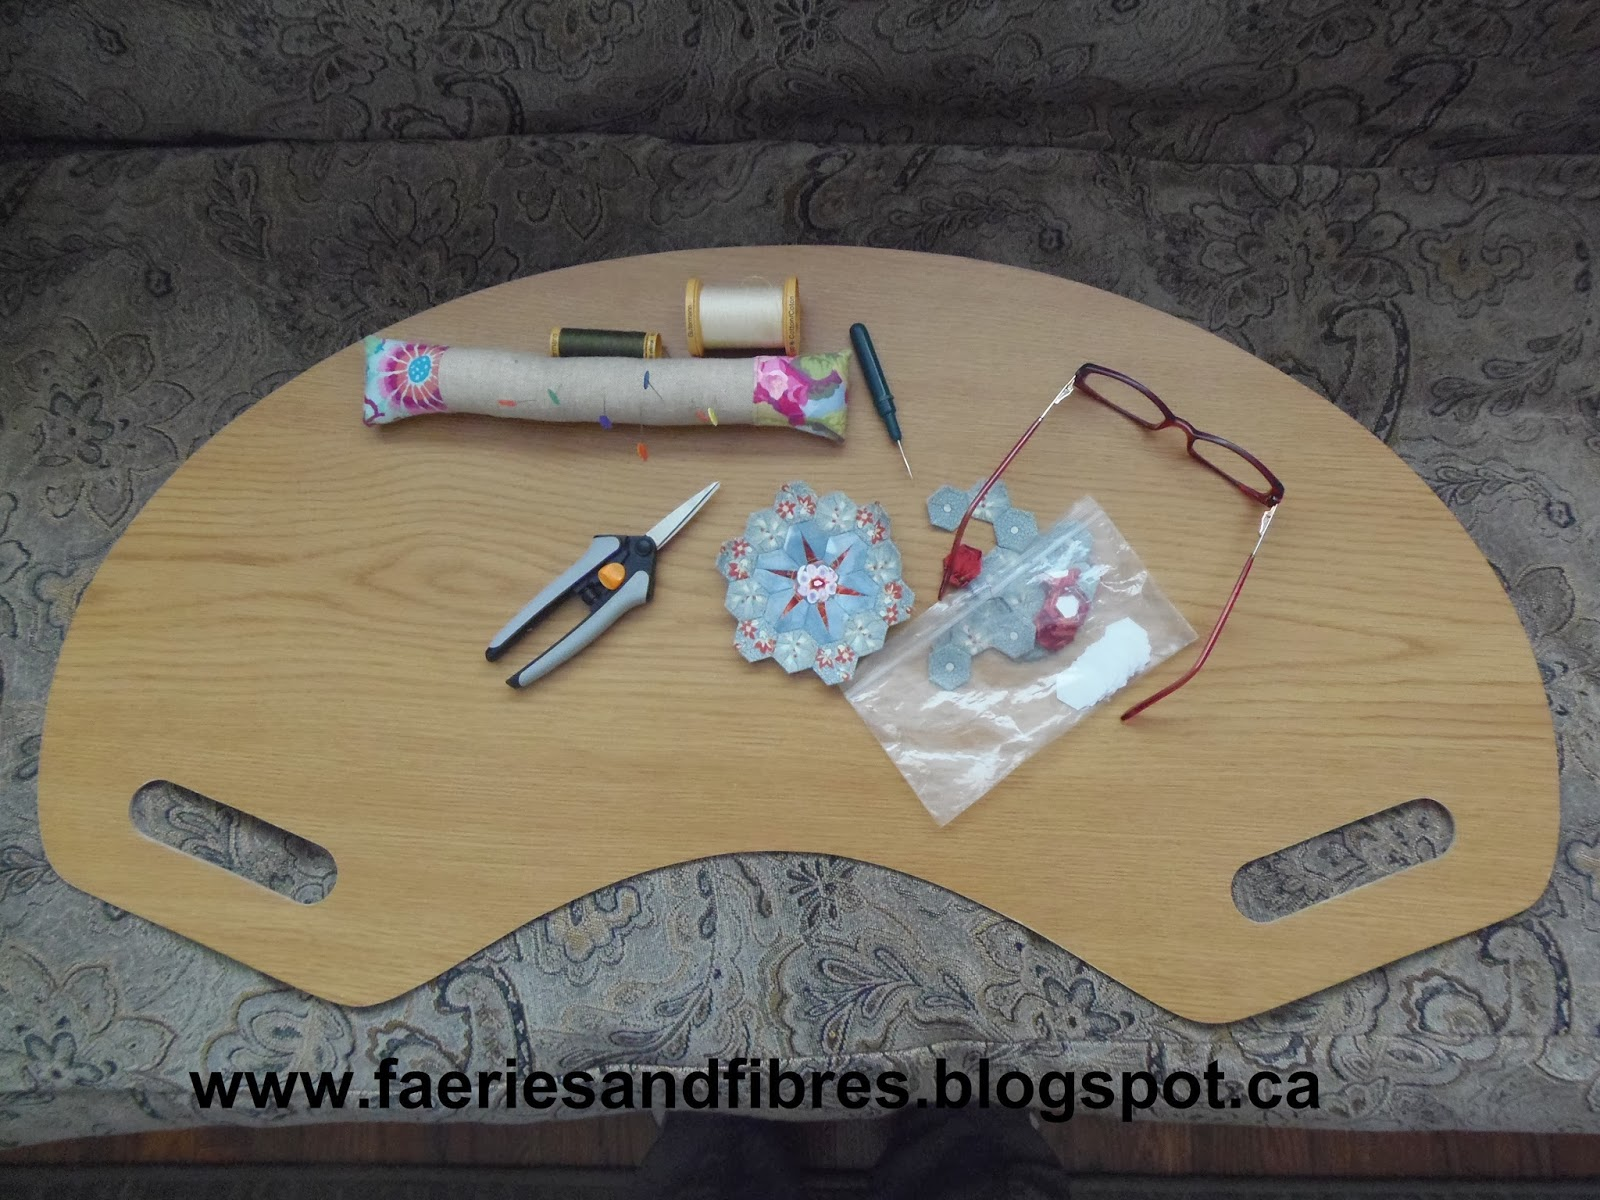 Enjoyable Faeries And Fibres Work Bench A Treasure A Mega Quilt Creativecarmelina Interior Chair Design Creativecarmelinacom